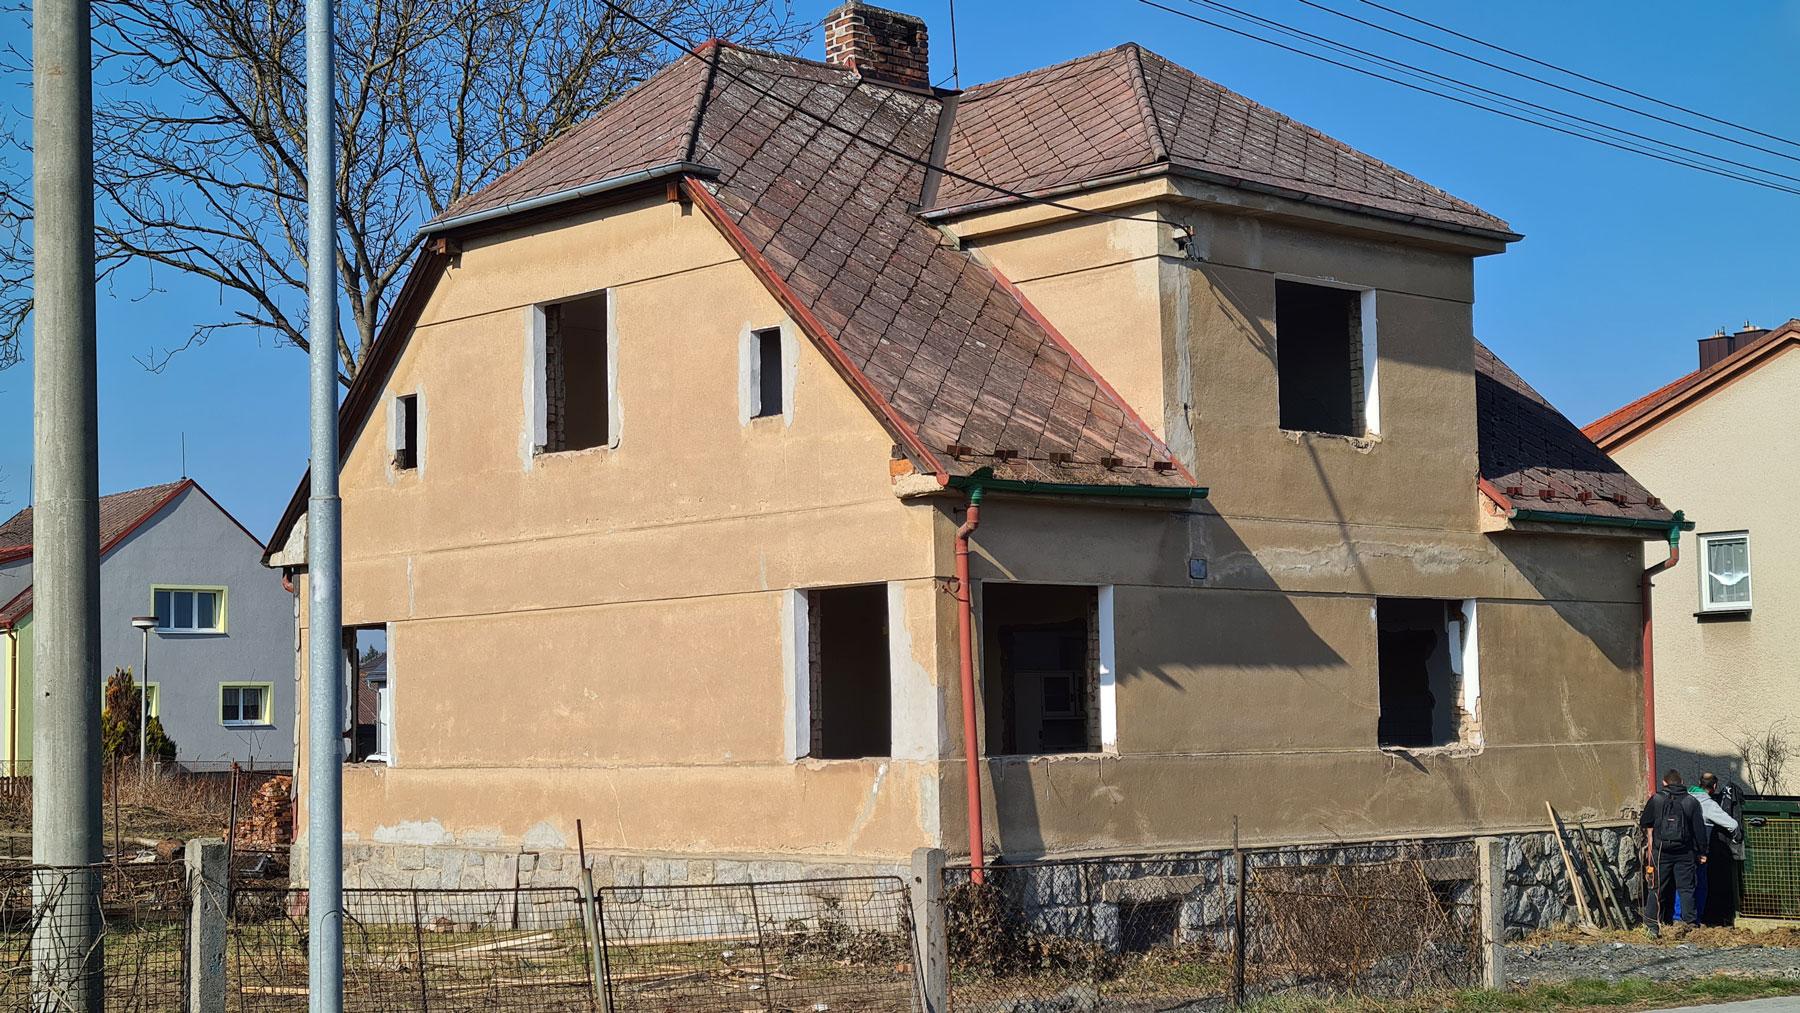 Nove-byty-Klatovy-zahajeni-demolice-Rezidence-pod-Sumavou (2)